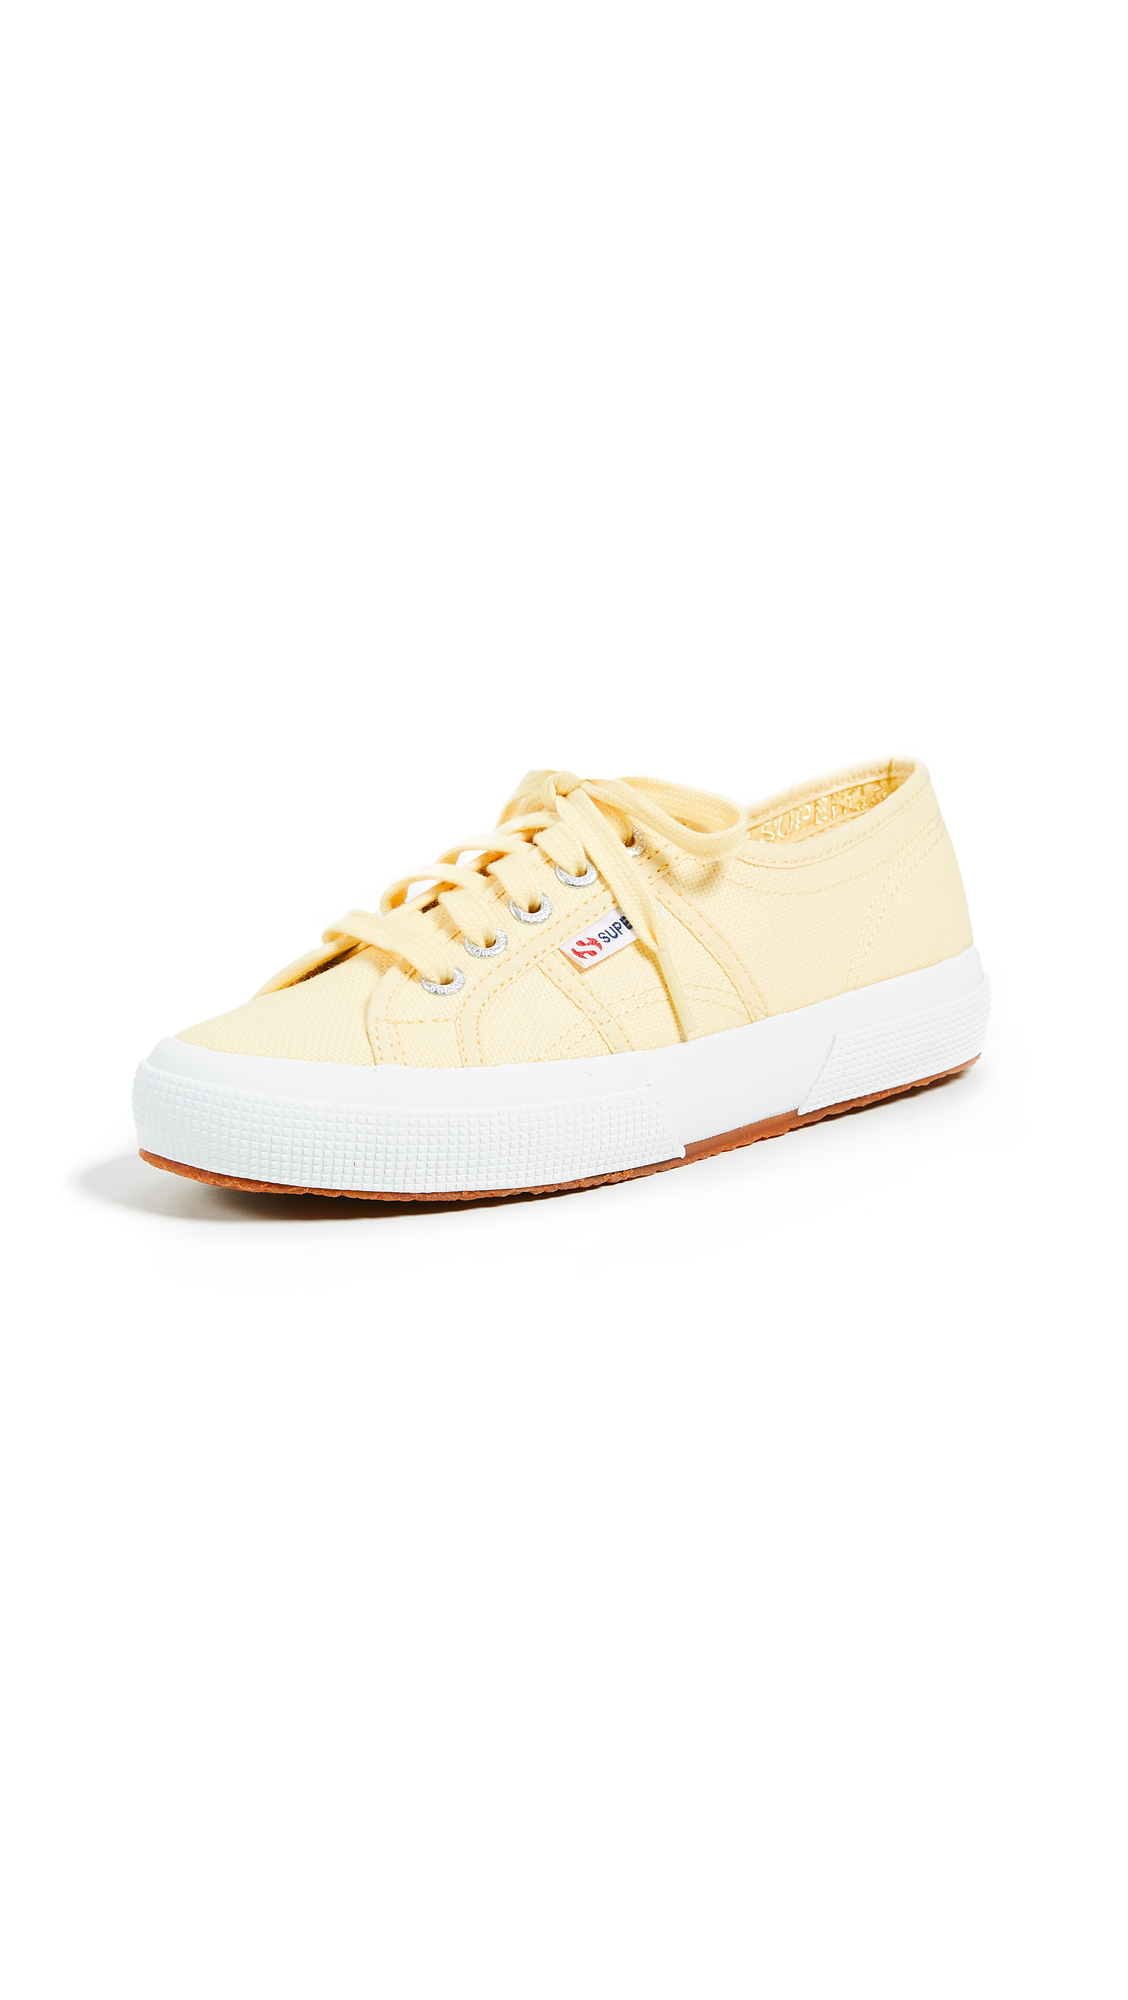 Superga 2750 Cotu Classic Sneakers - Yellow